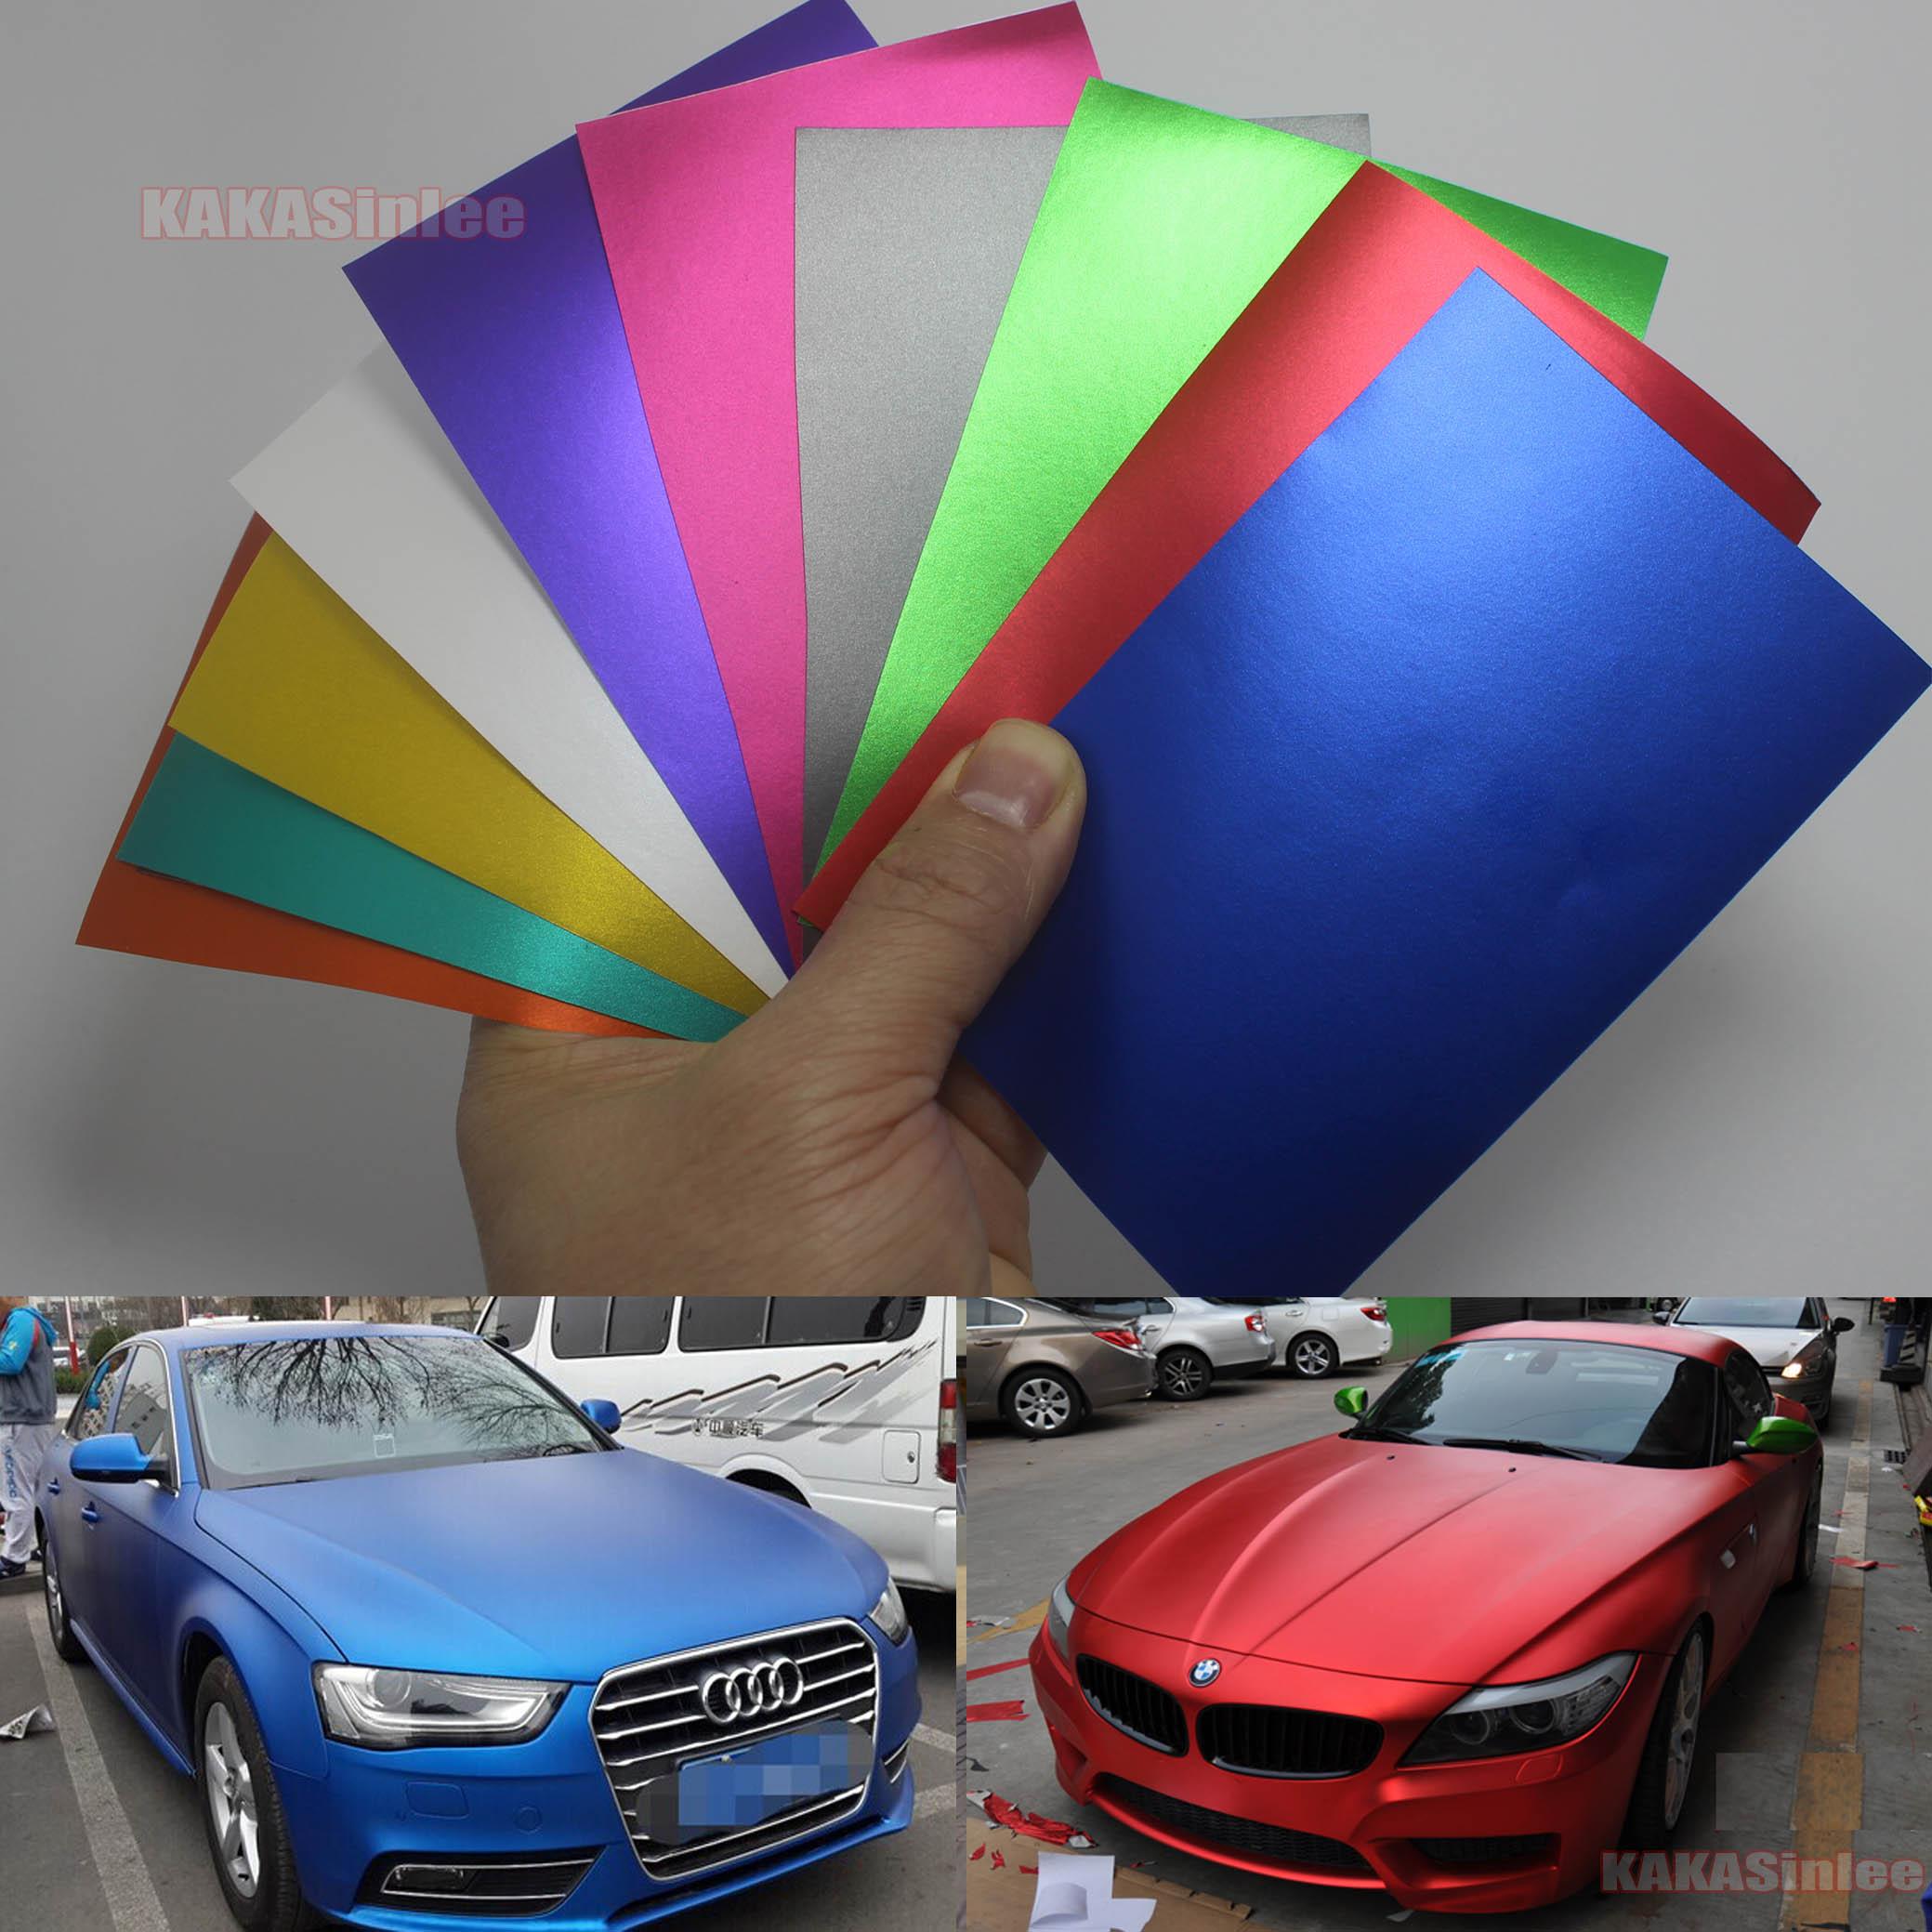 Test Sample 8cm X 12cm Car Metal Satin Matte Chrome